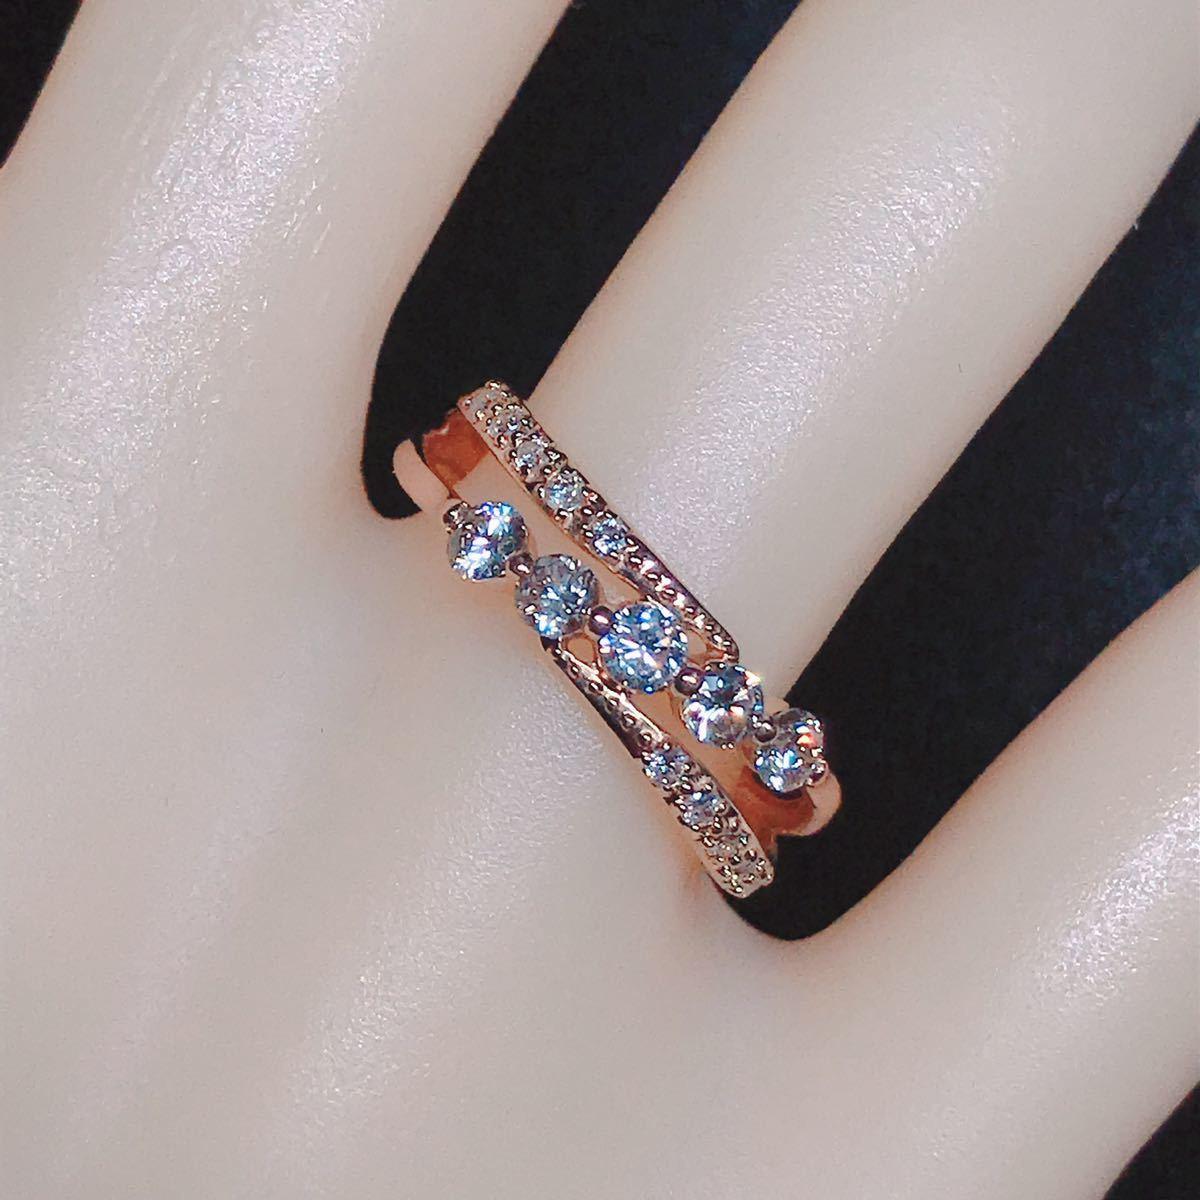 0.50ct ダイヤモンドリング K18 ダイヤ ウェーブ ミル打ち 上品 幅広_画像7